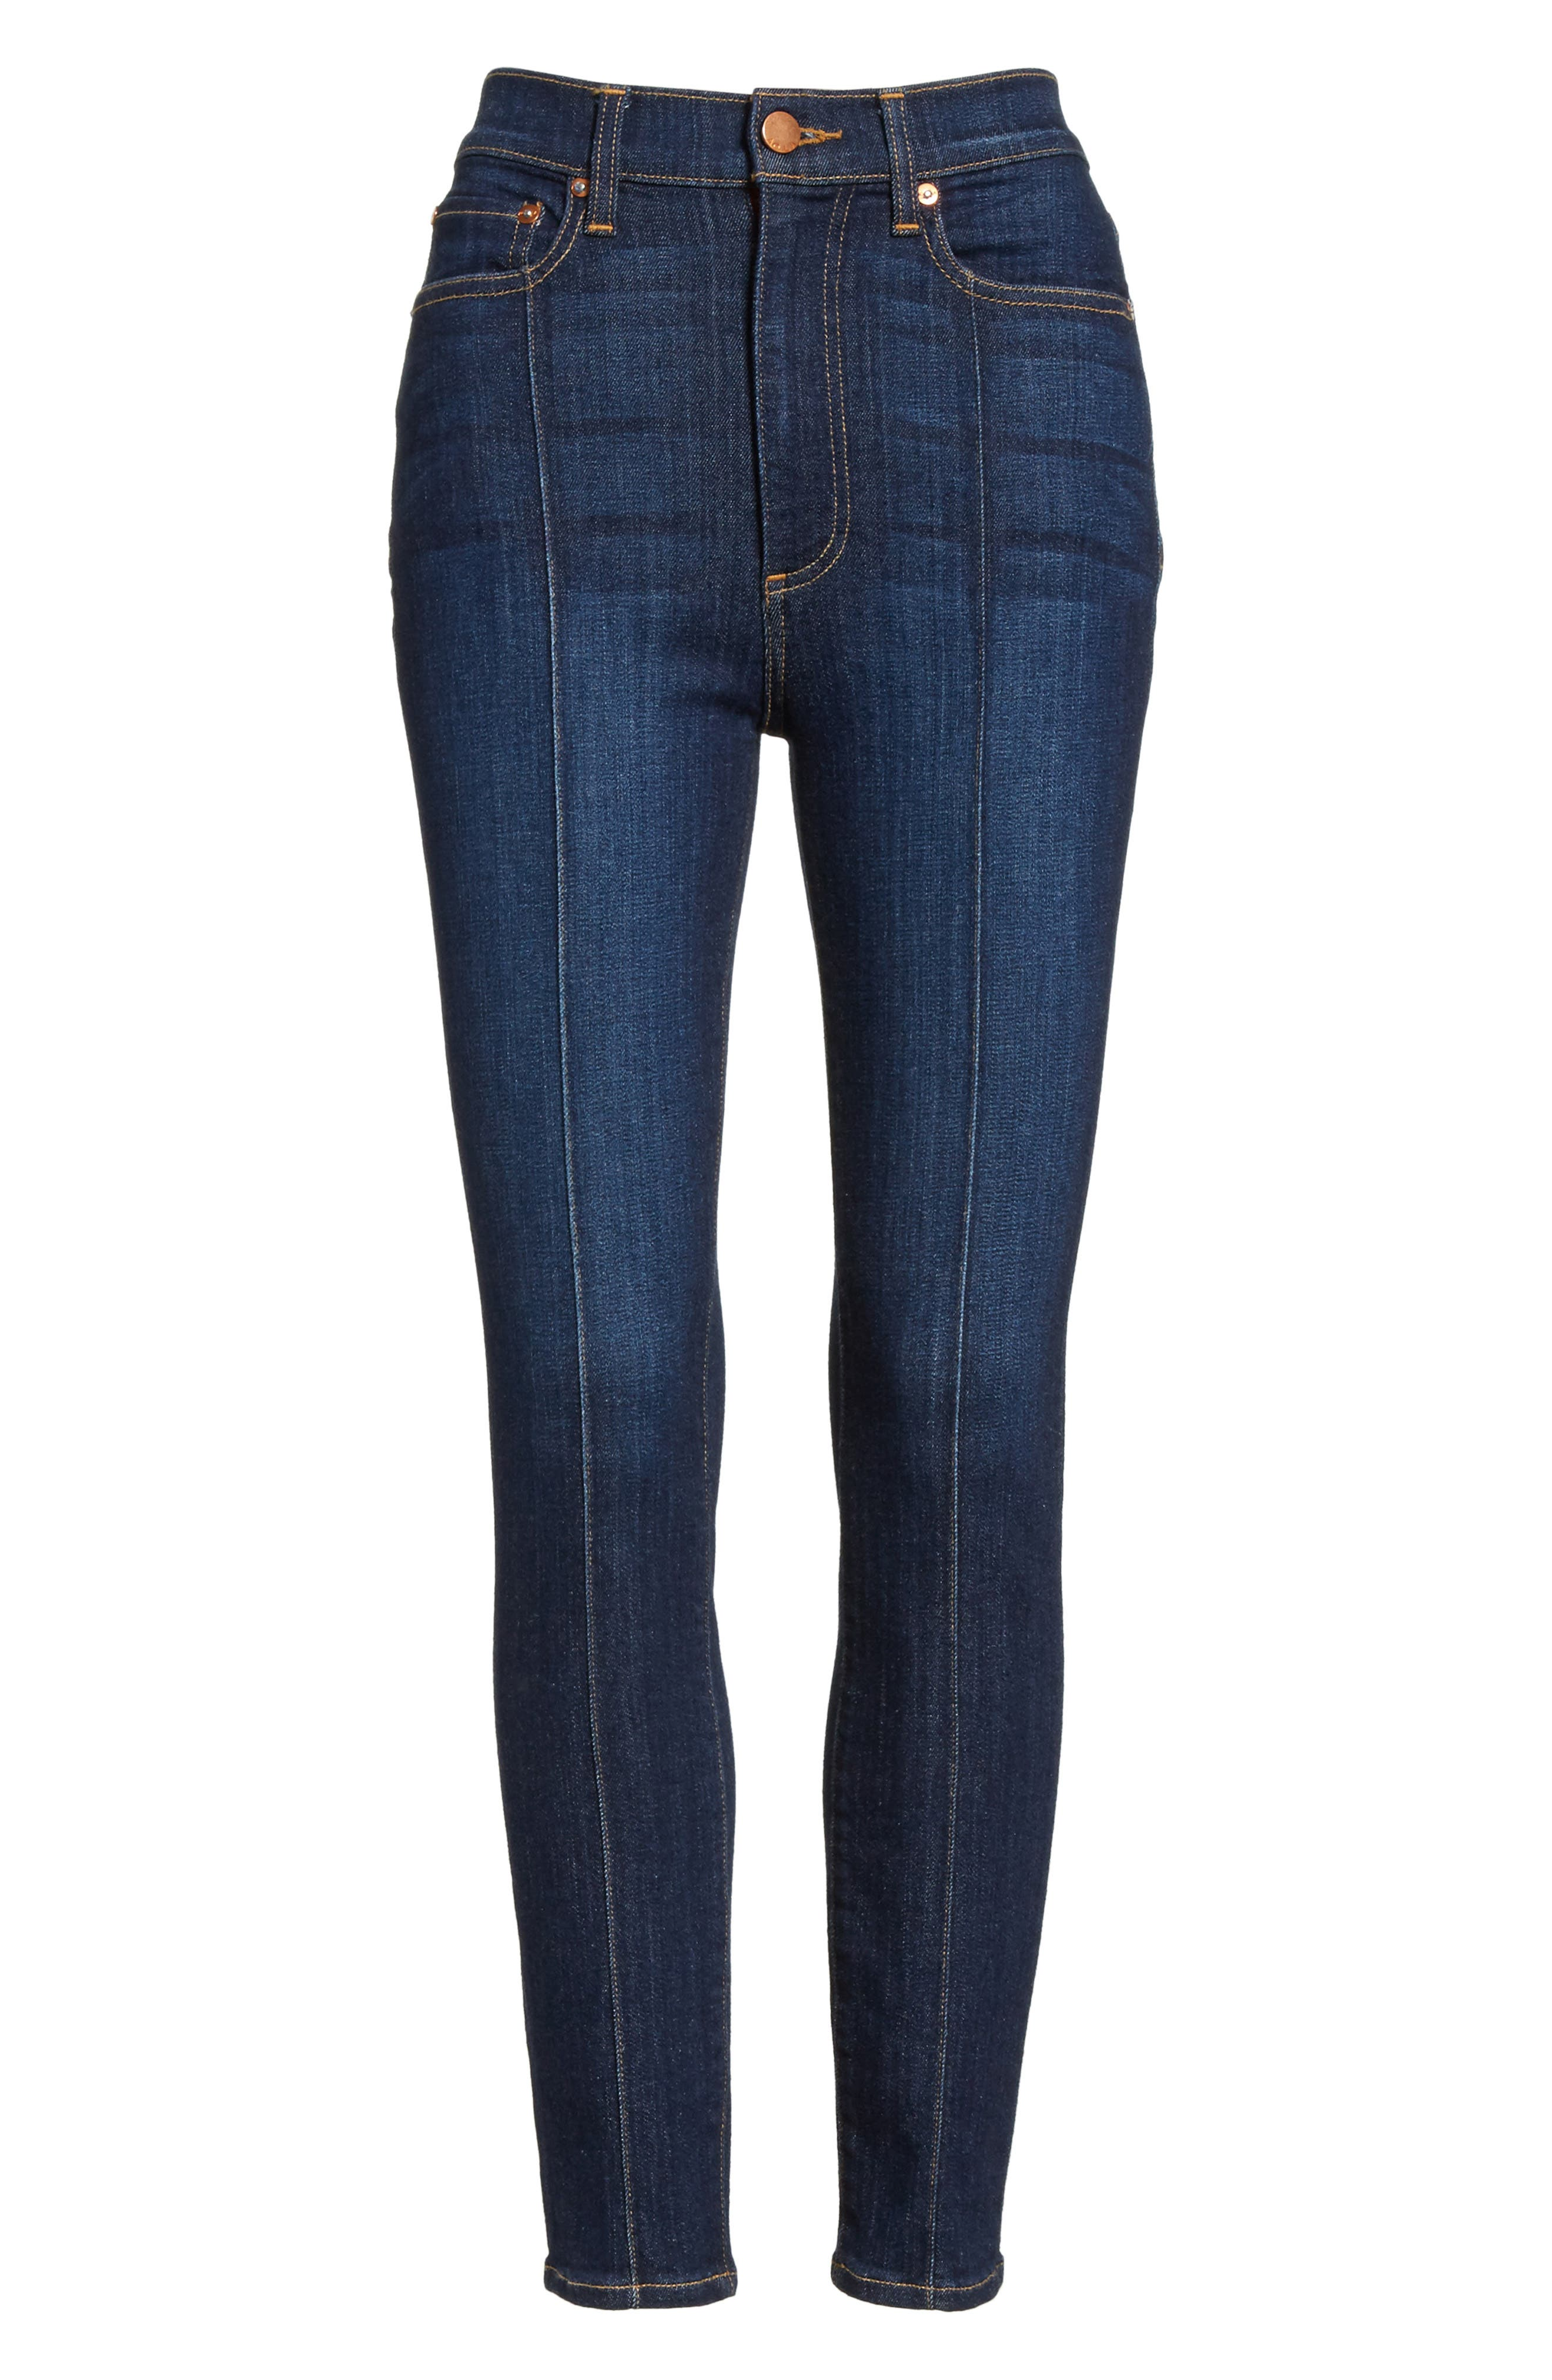 AO.LA Good High Waist Pintuck Skinny Jeans,                             Alternate thumbnail 6, color,                             Dream On